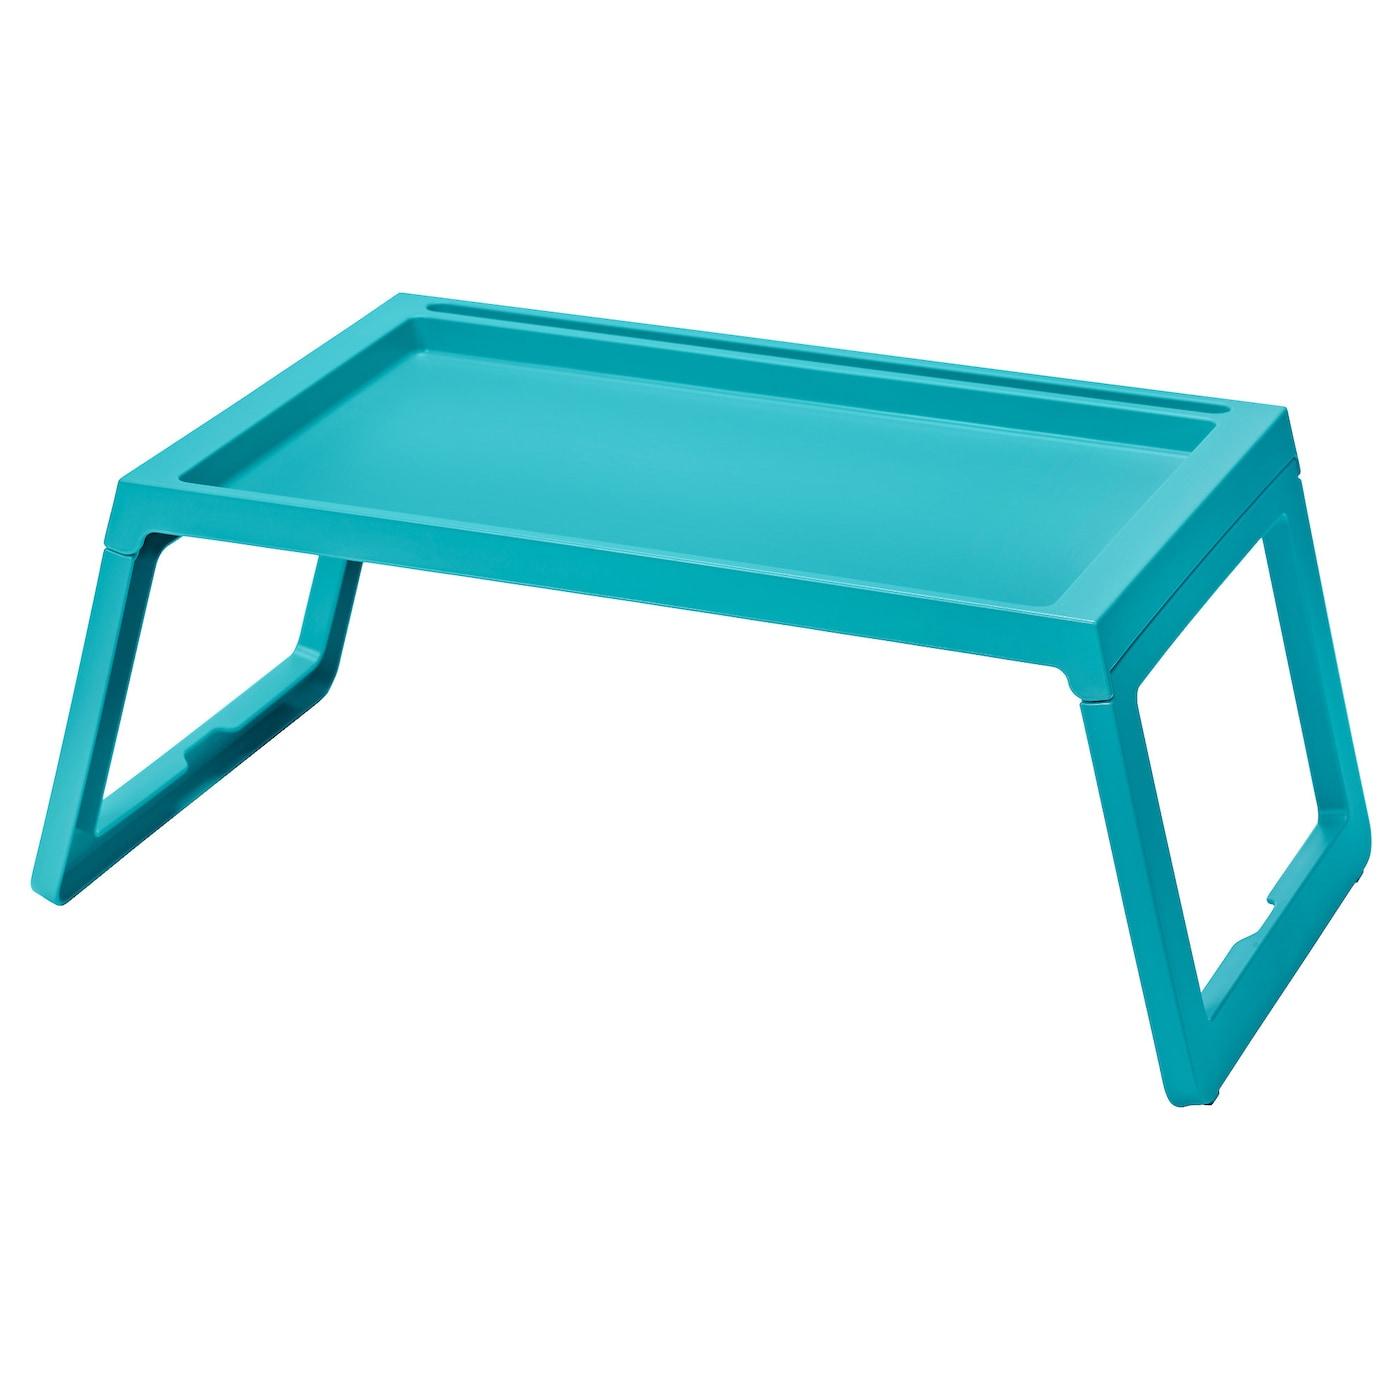 Vente table de lit ikea - Ikea achat en ligne ...